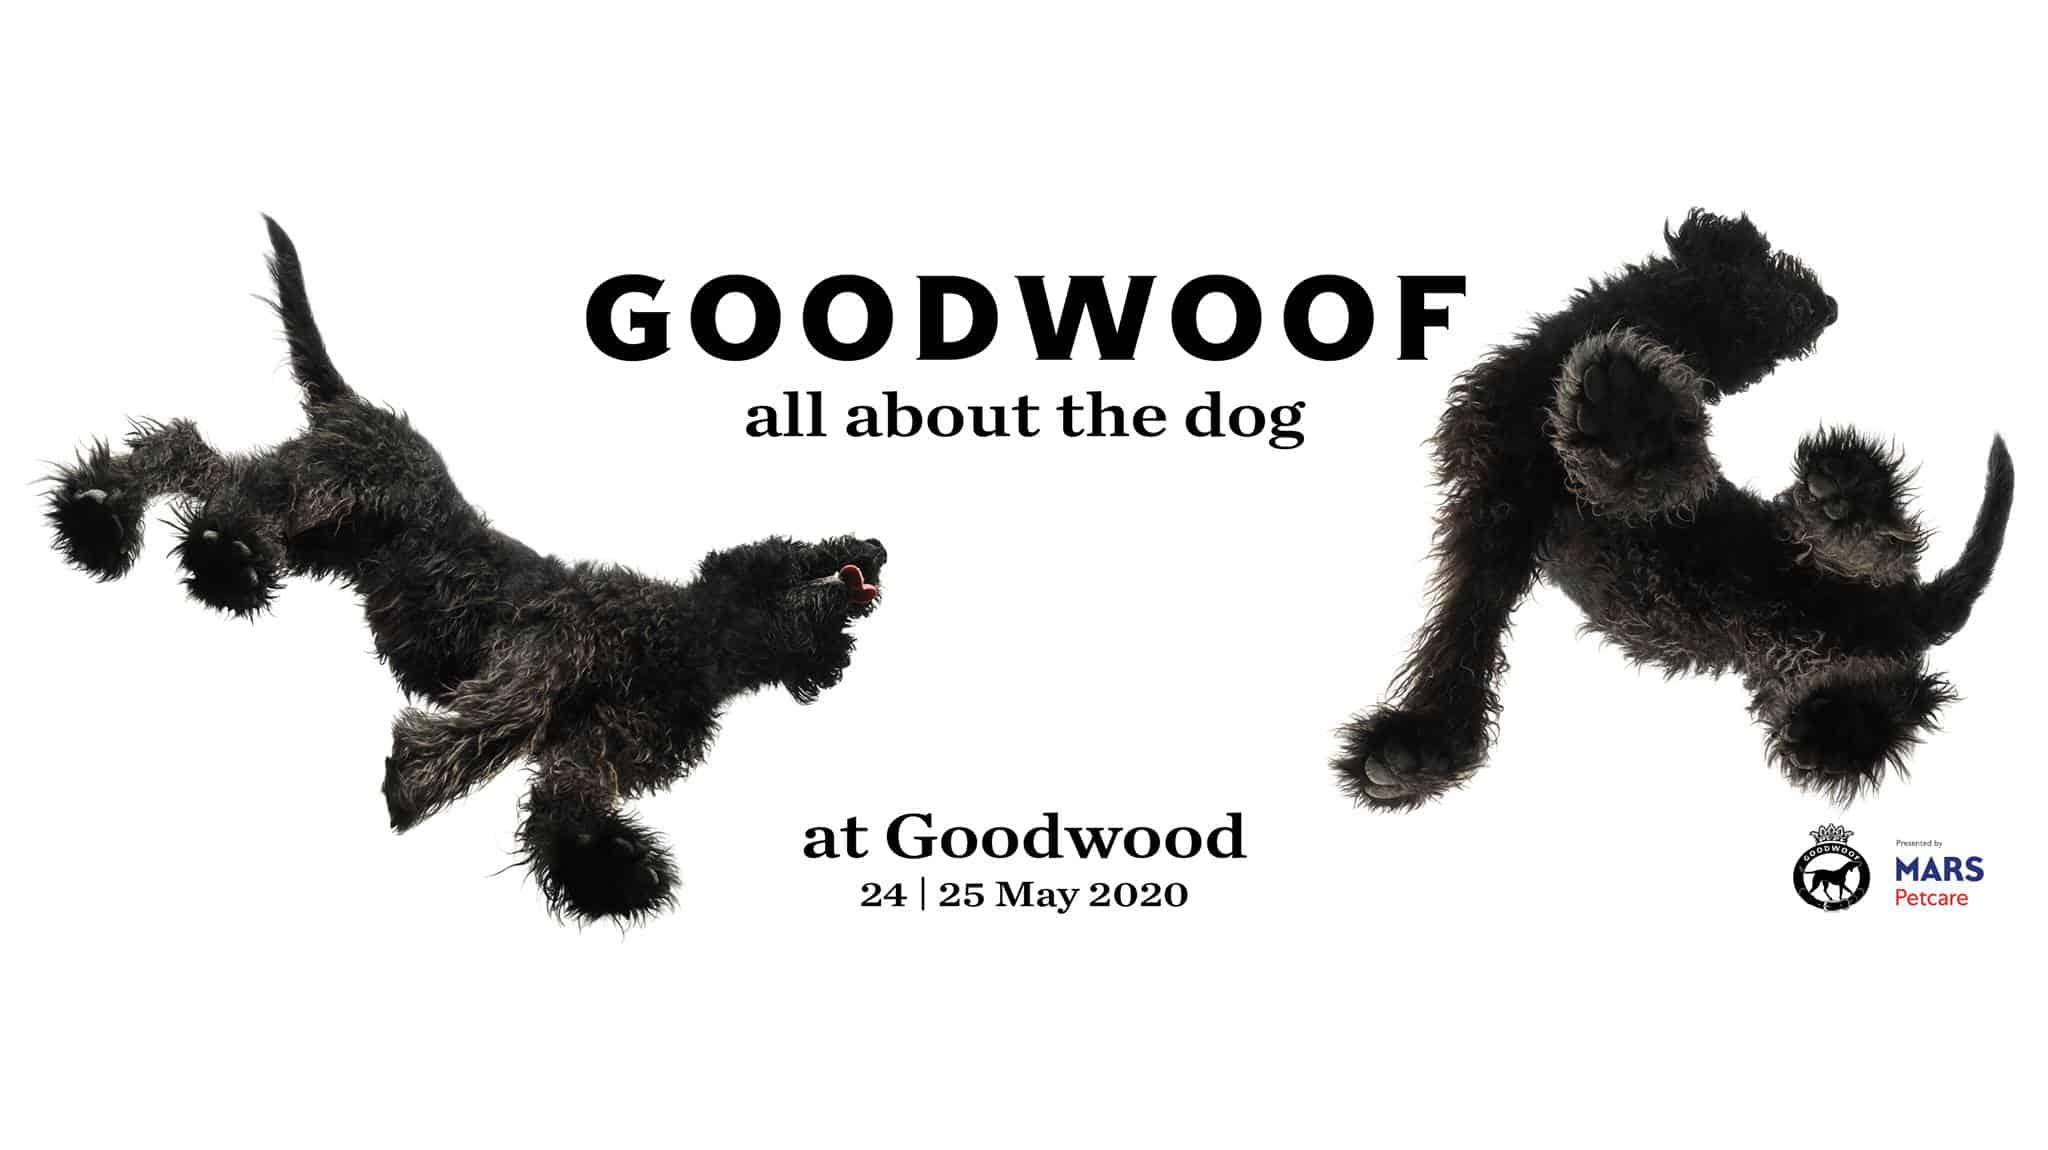 Goodwoof at Goodwood